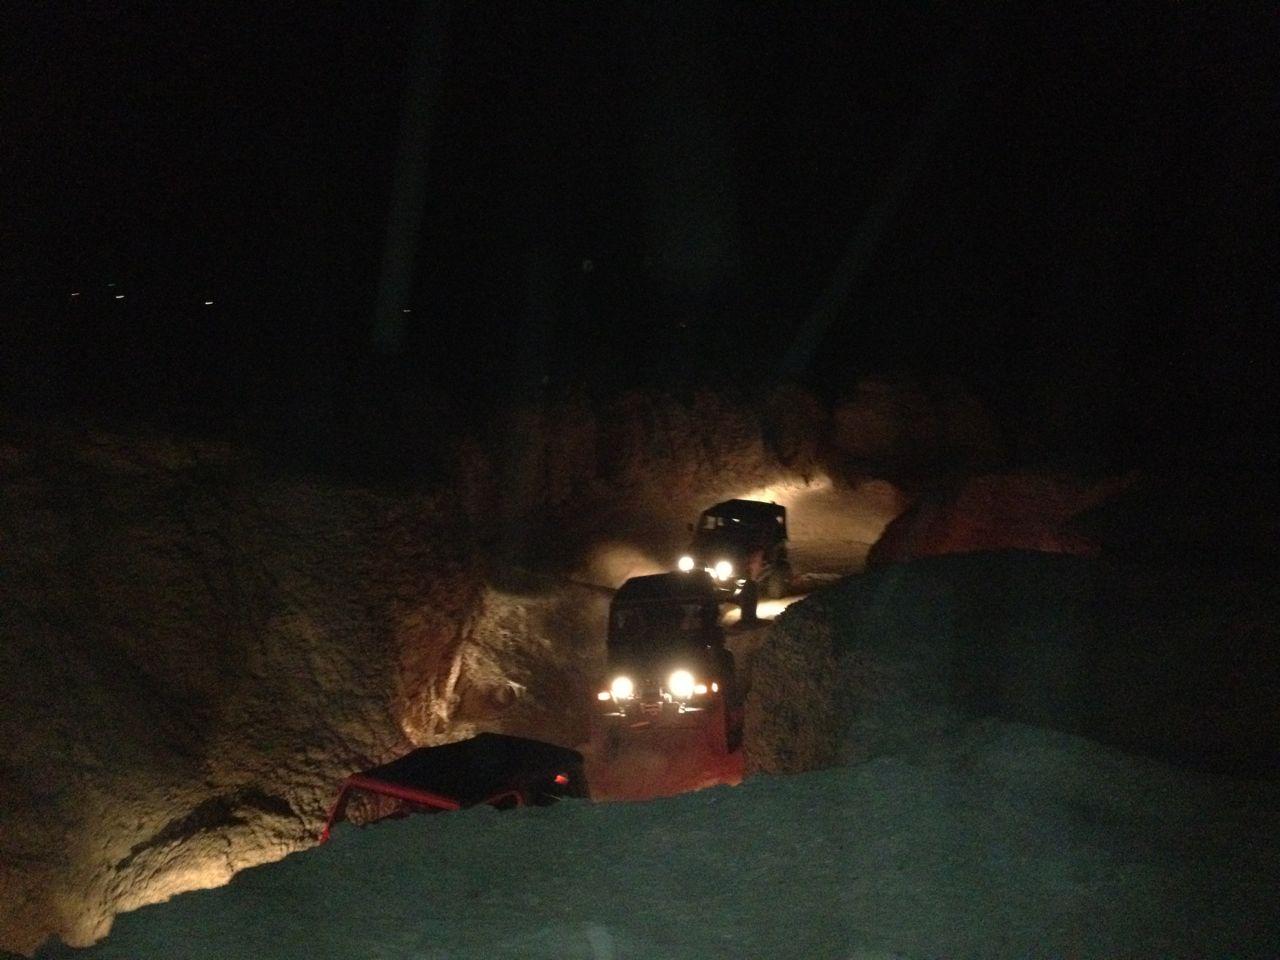 jeep-night-1.jpg